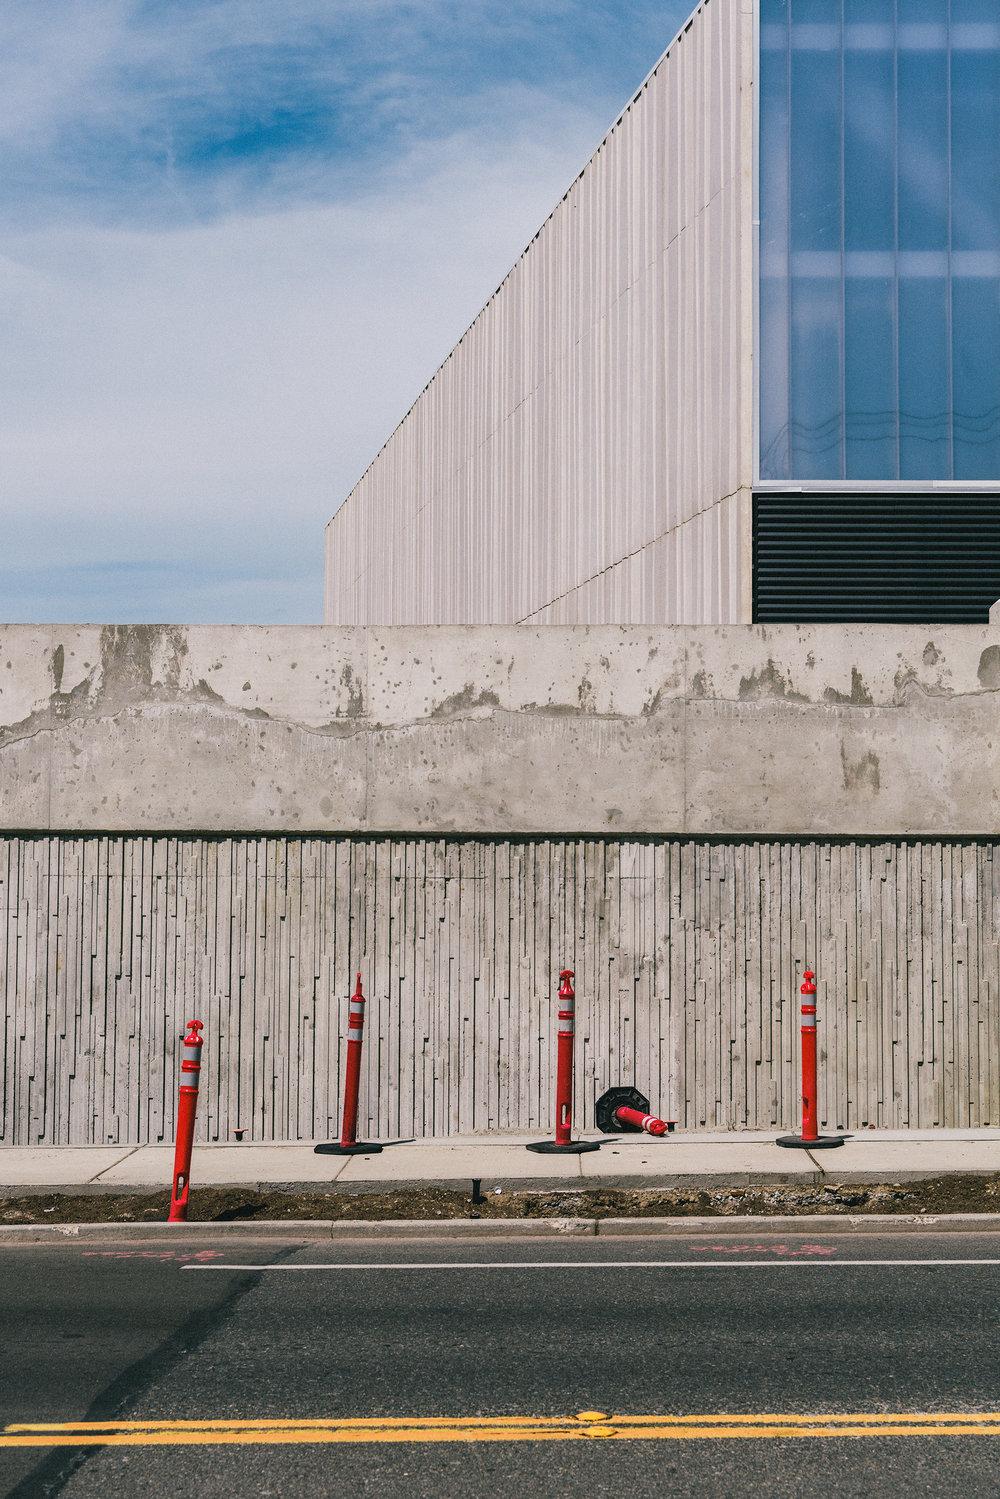 Seattle, Washington State, 2016